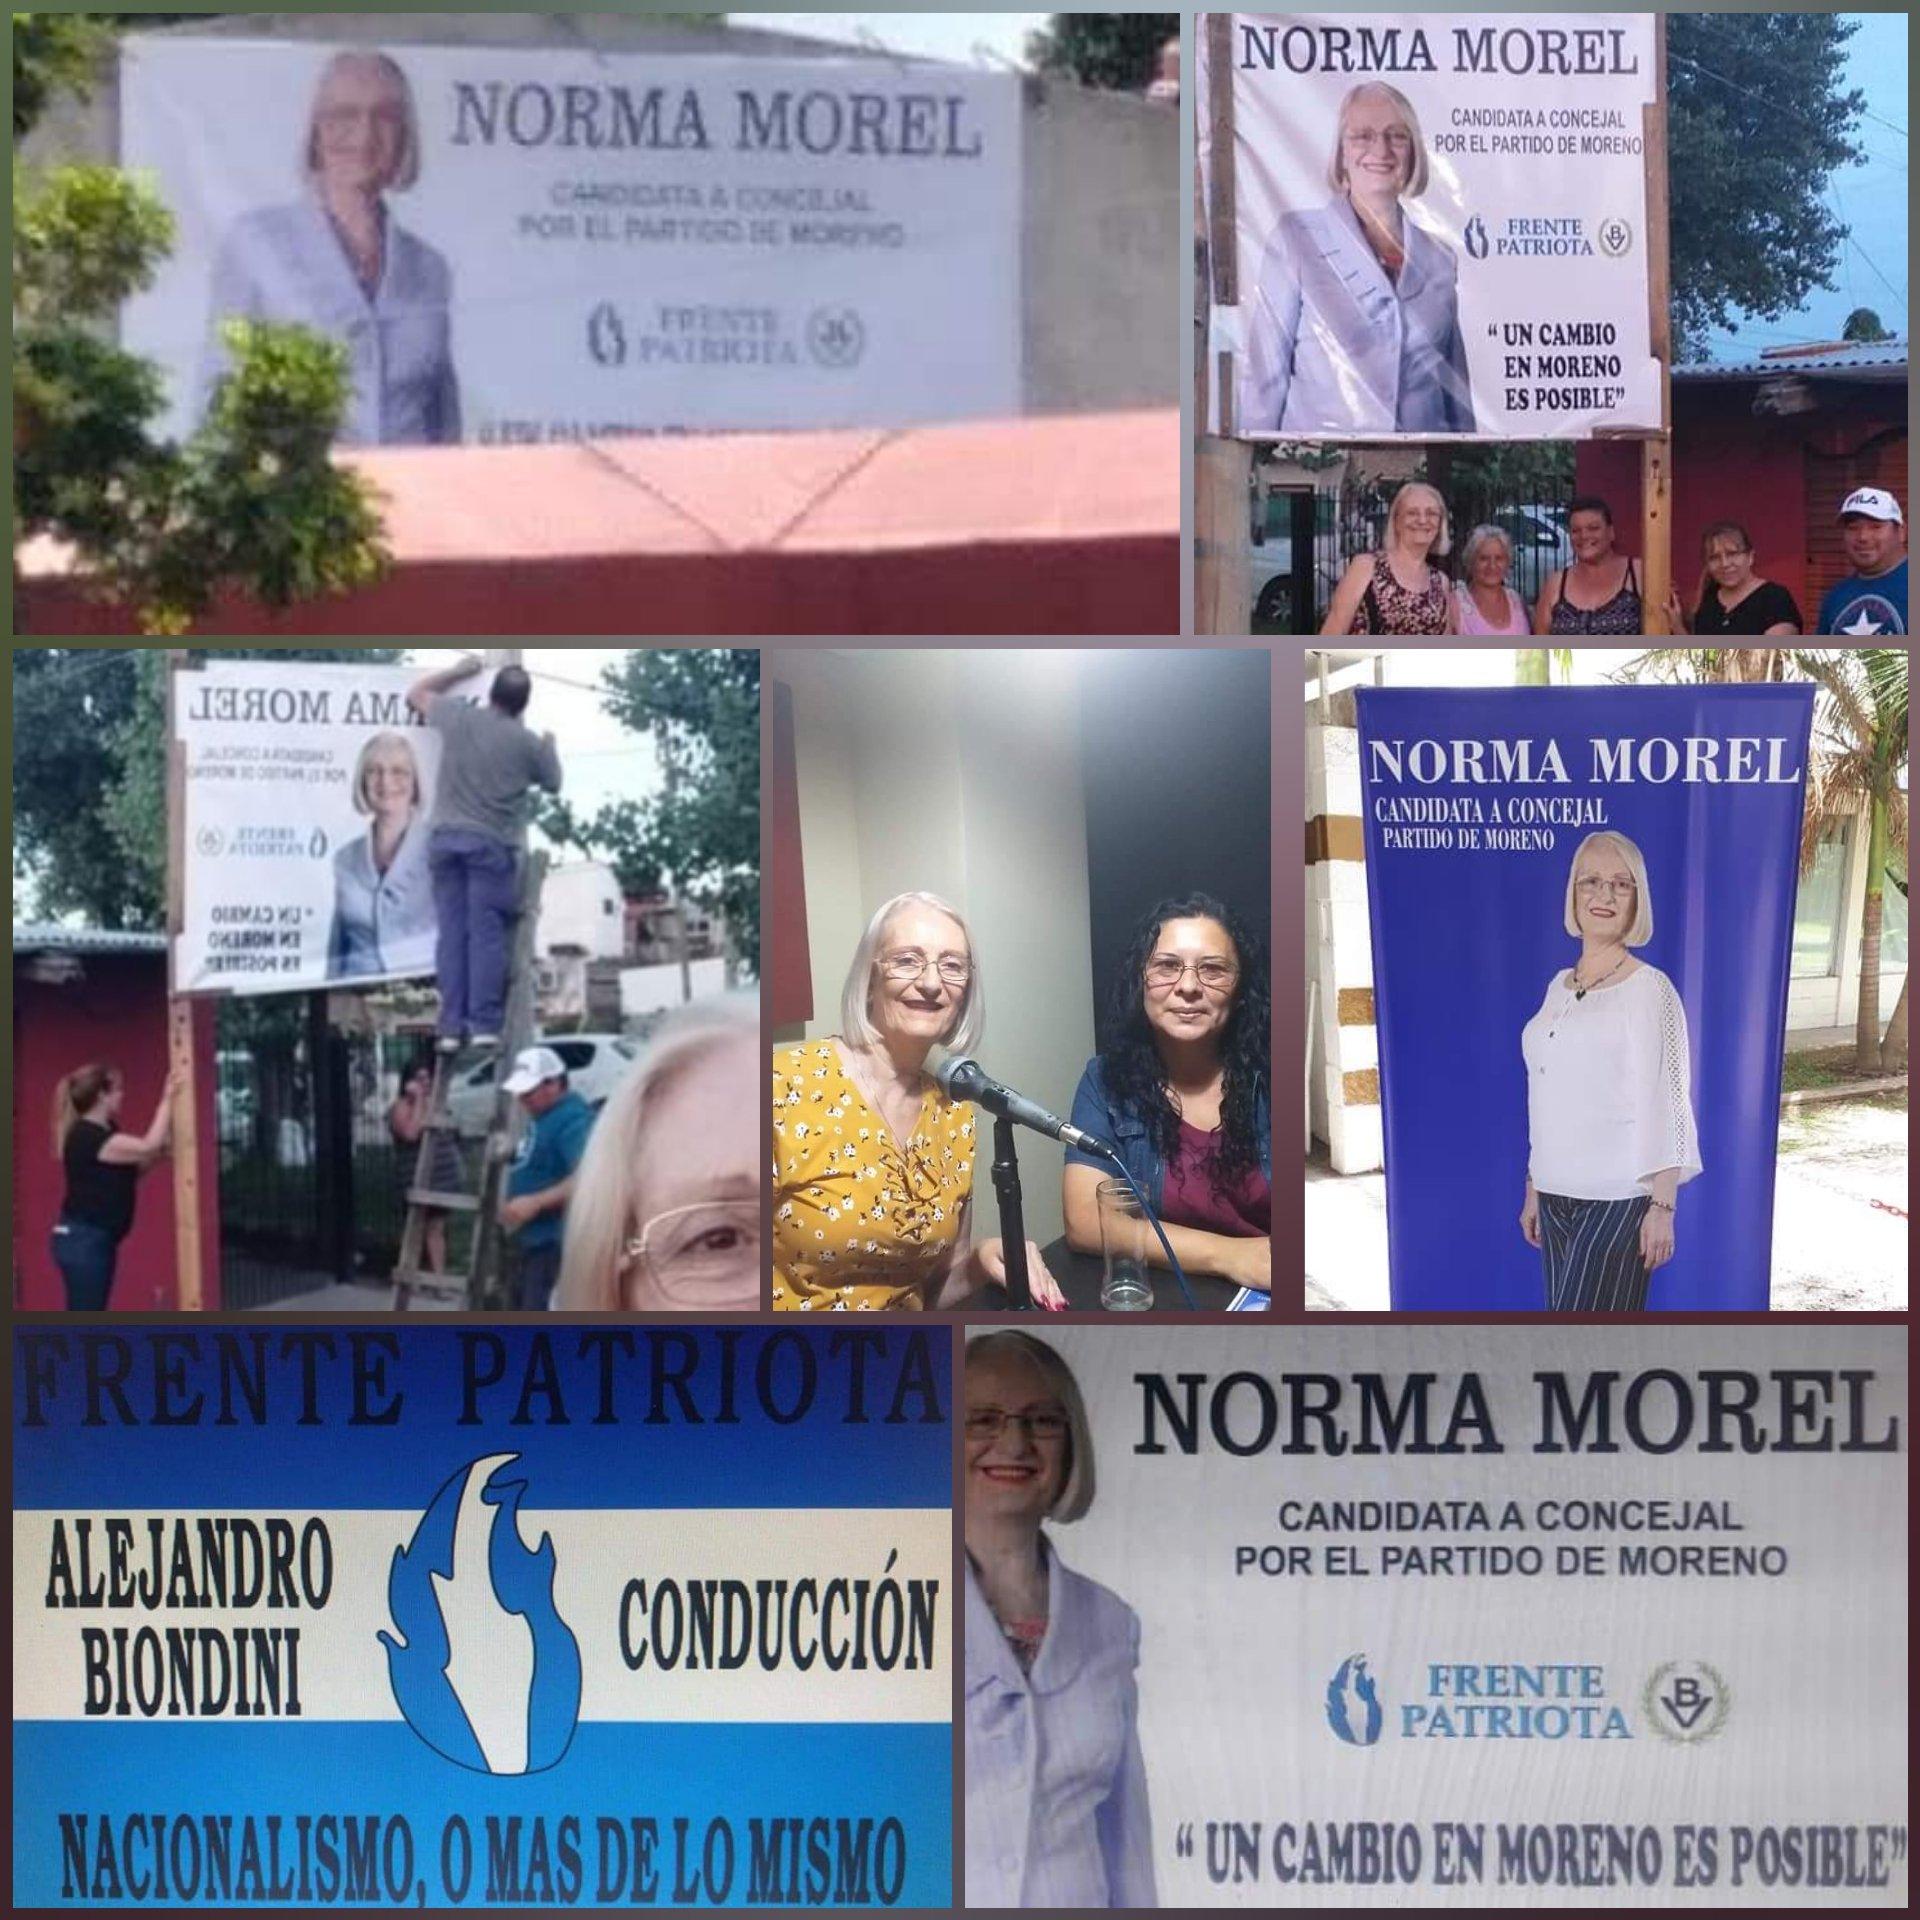 Moreno: Campaña de Norma Morel